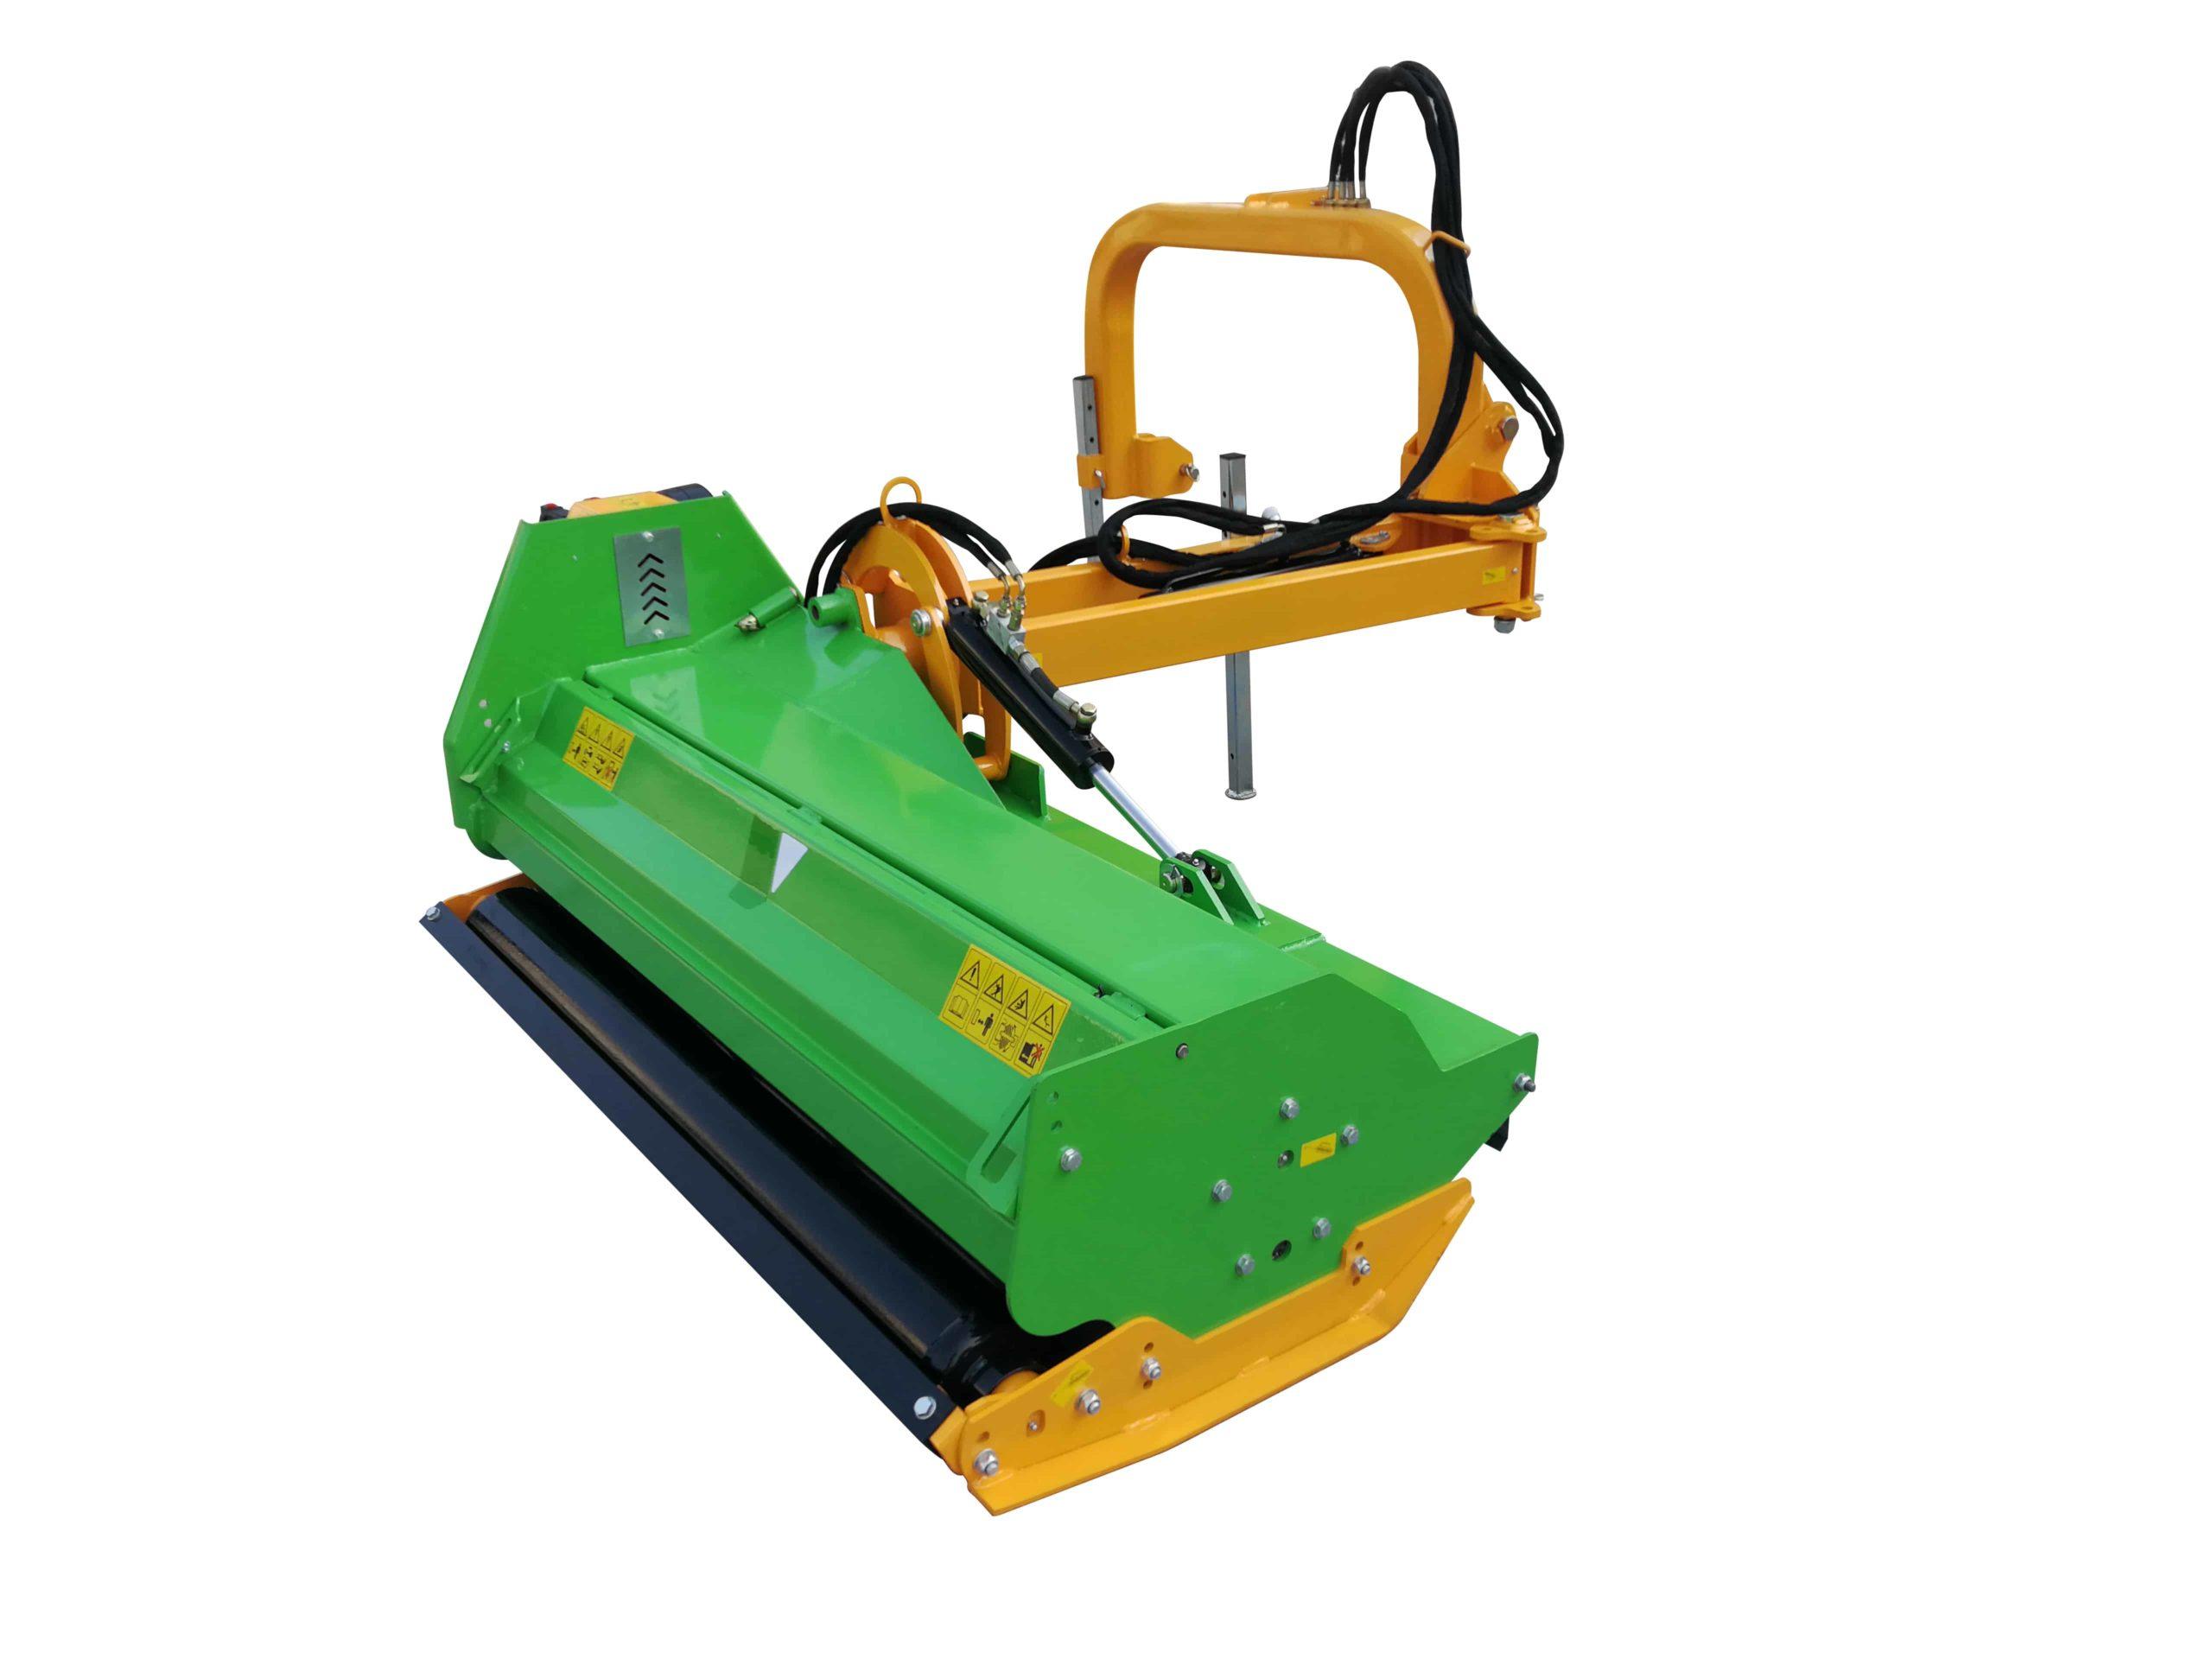 EMHD-180(A) Heavy Duty Ditch Bank Flail Mower